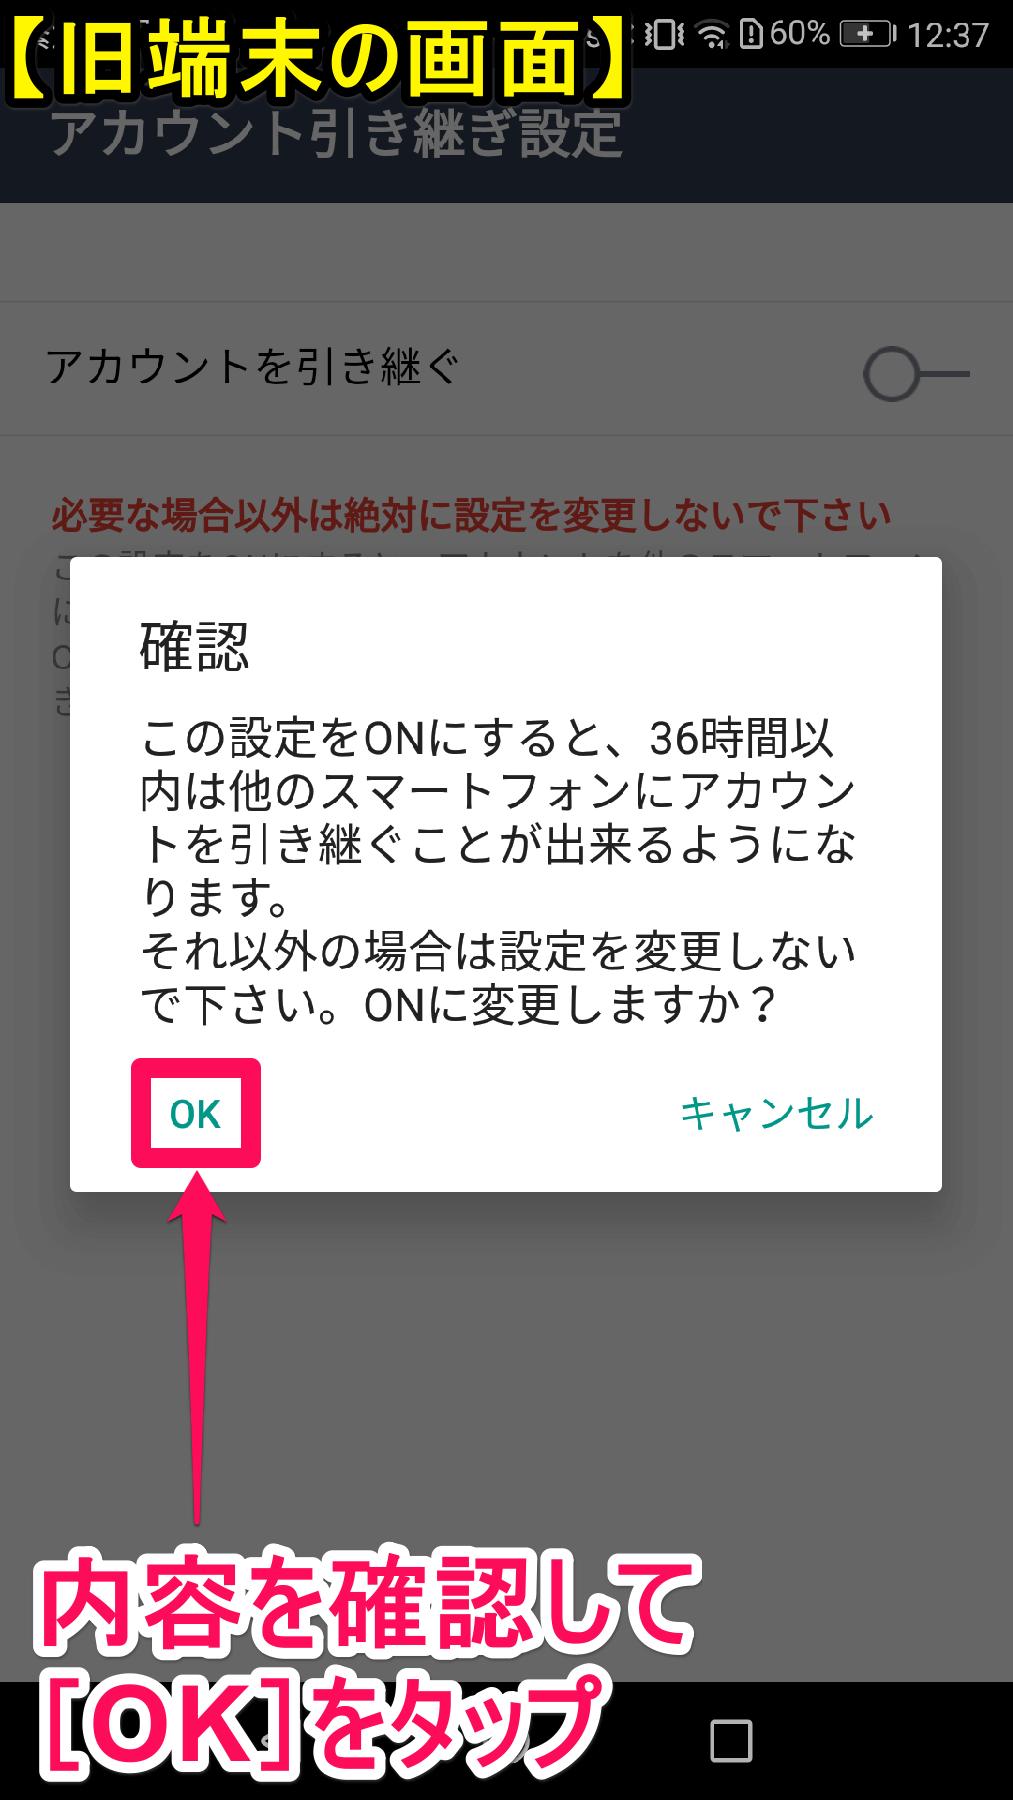 LINE(ライン)の移行元(旧端末)の[確認]画面